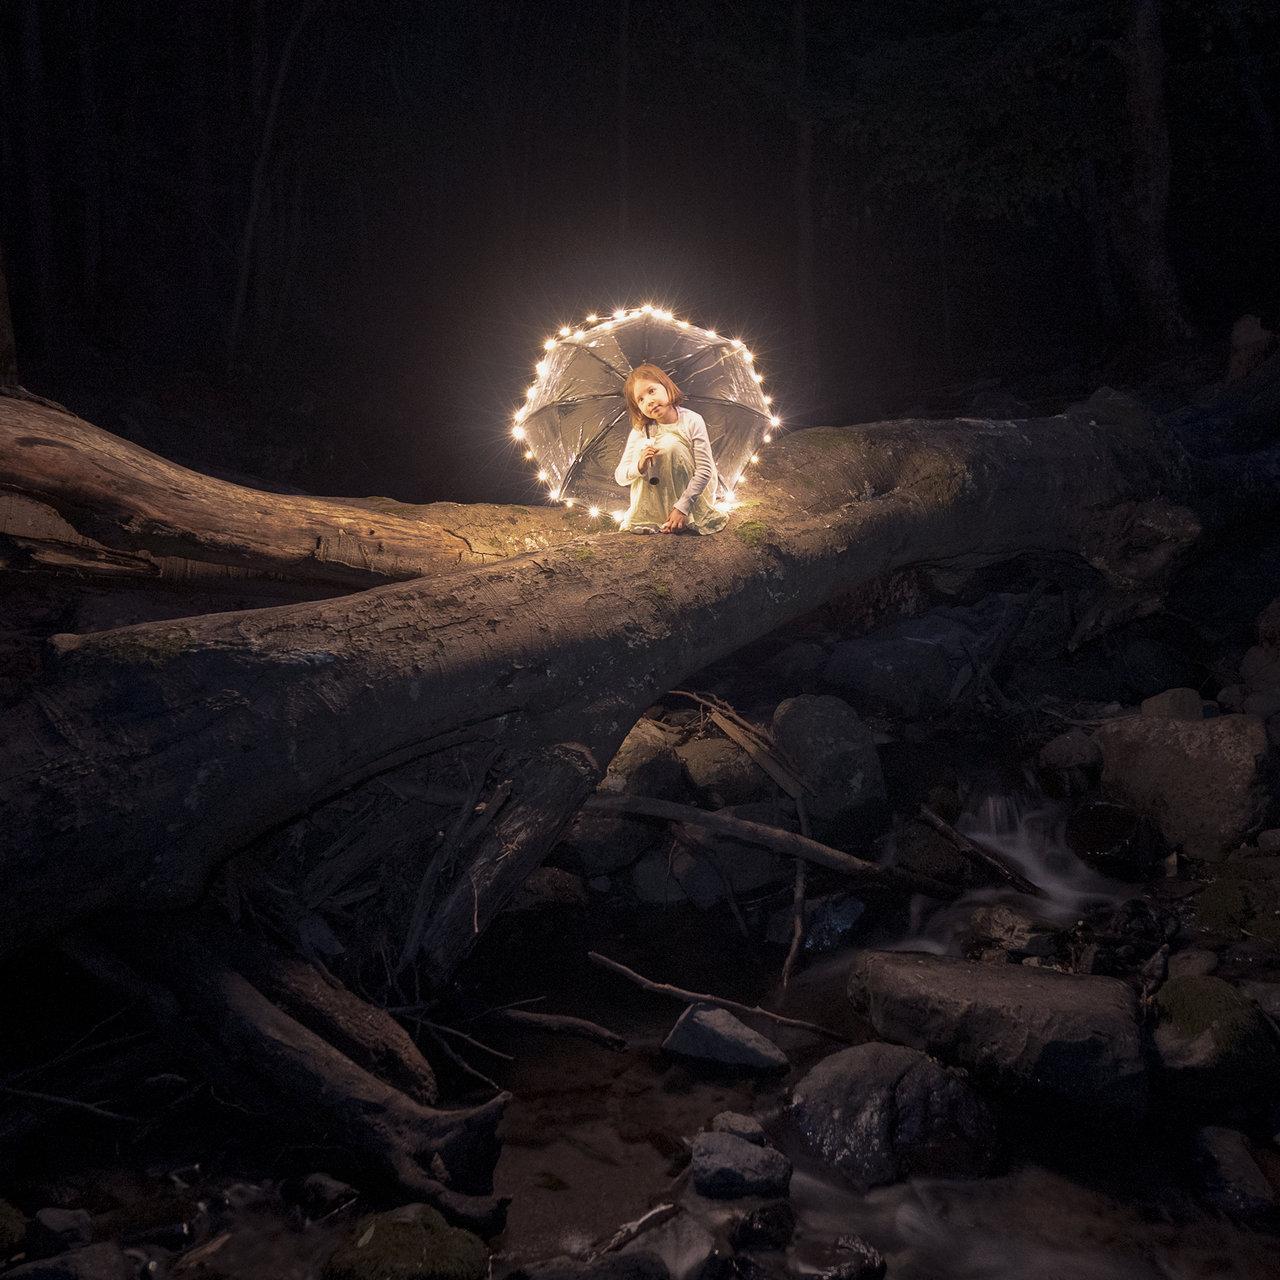 Горска фея | Author Mihail Minkov - takama | PHOTO FORUM